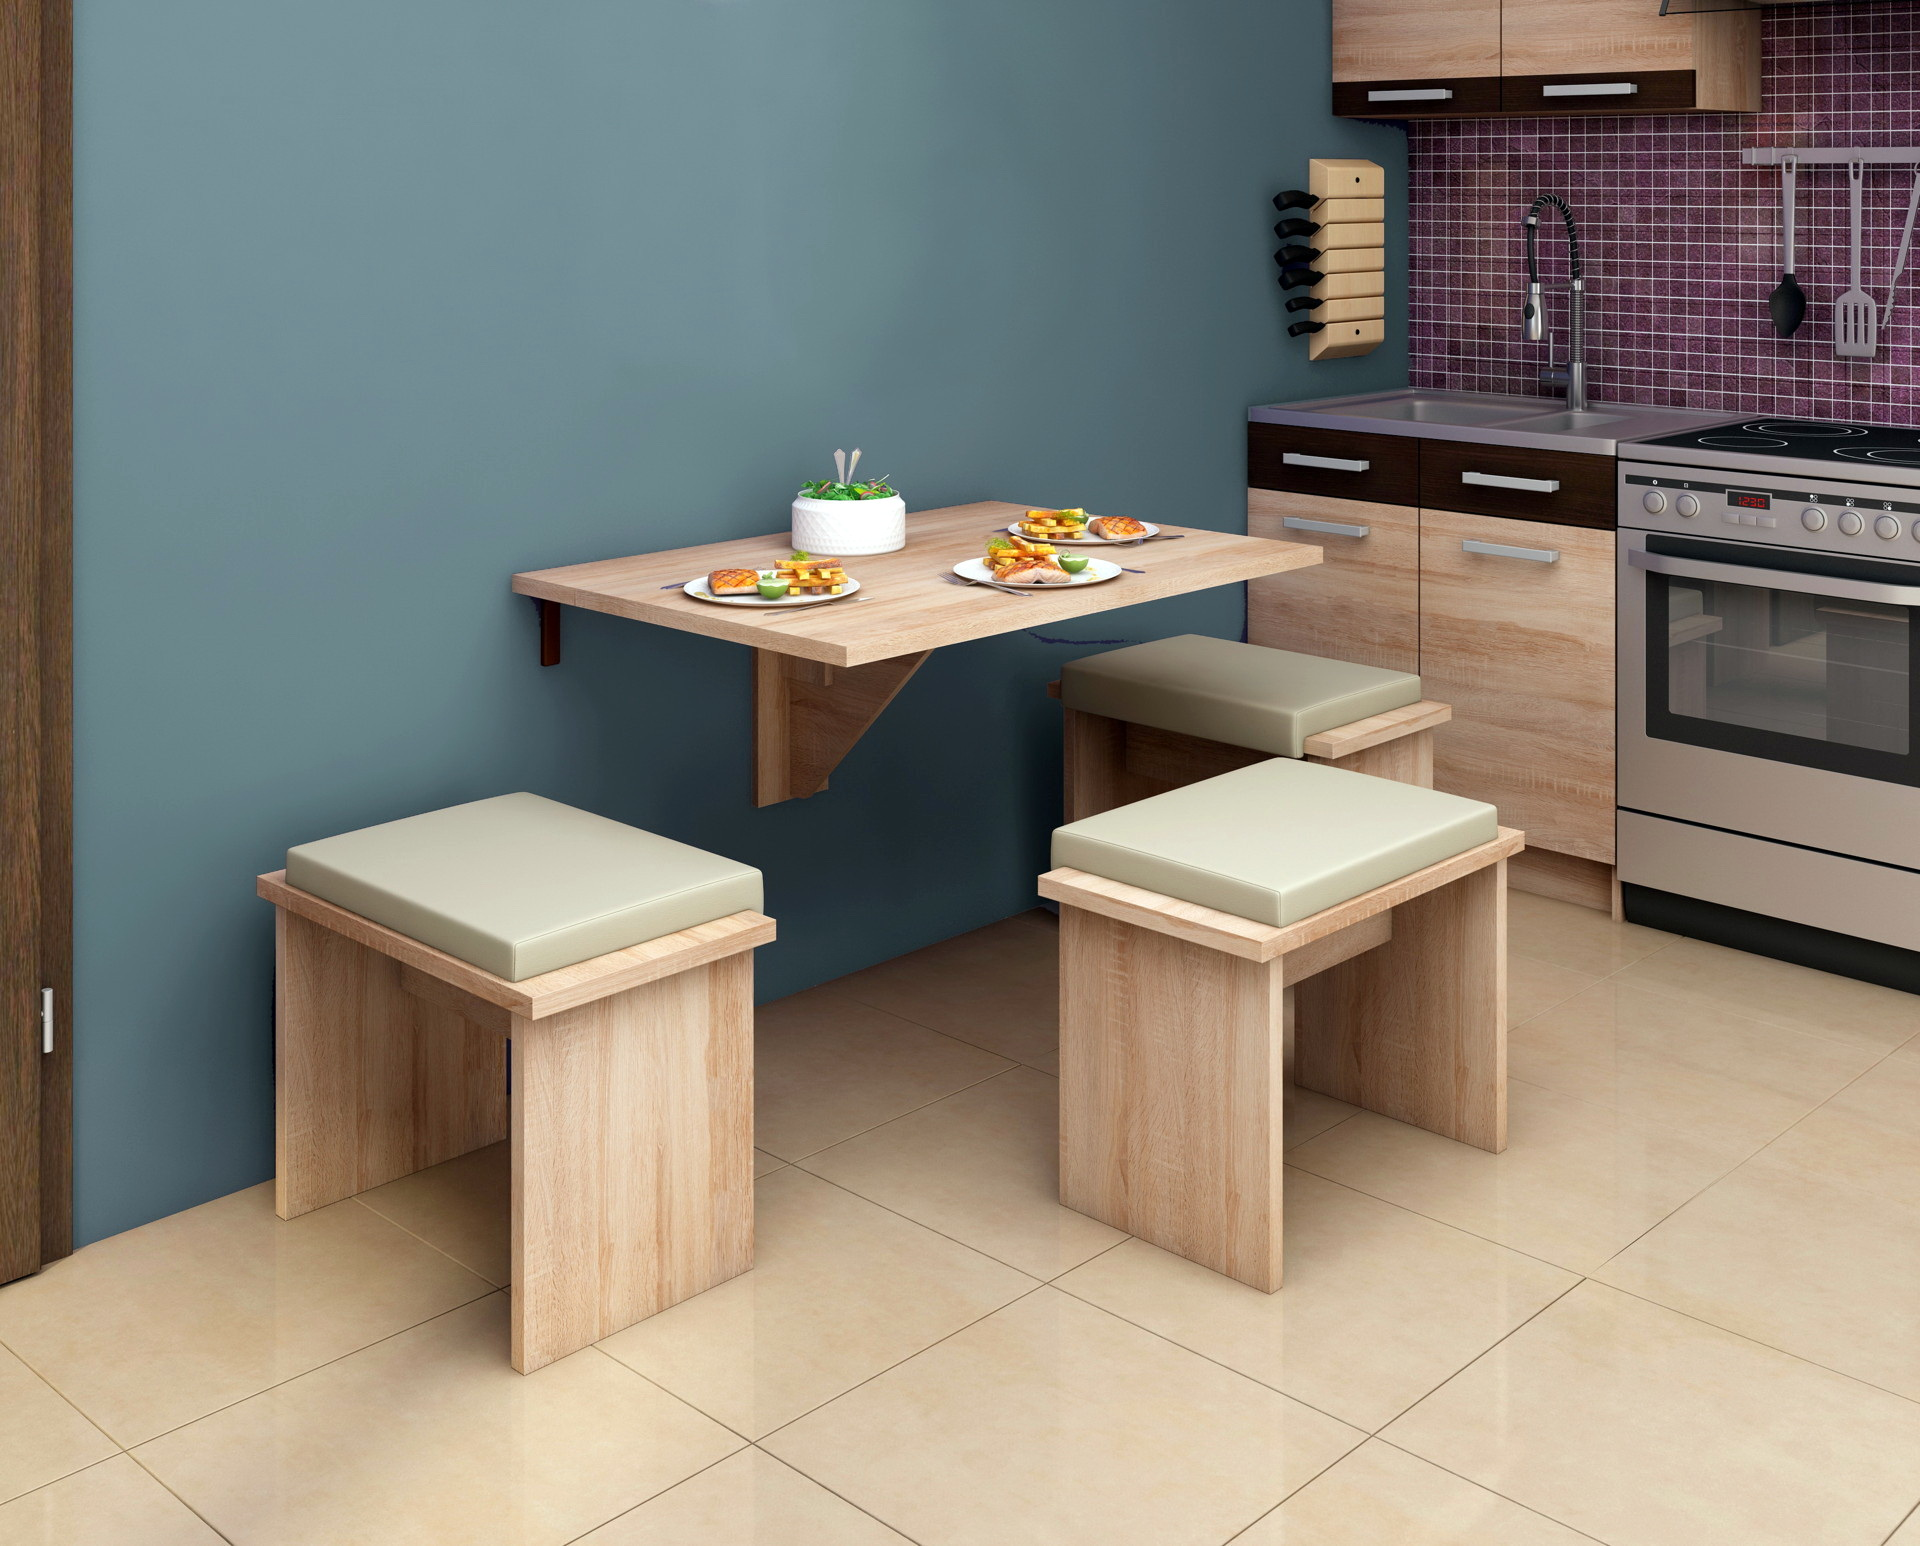 Mesas cocina plegables by Herdasa - Muebles ANTOÑÁN